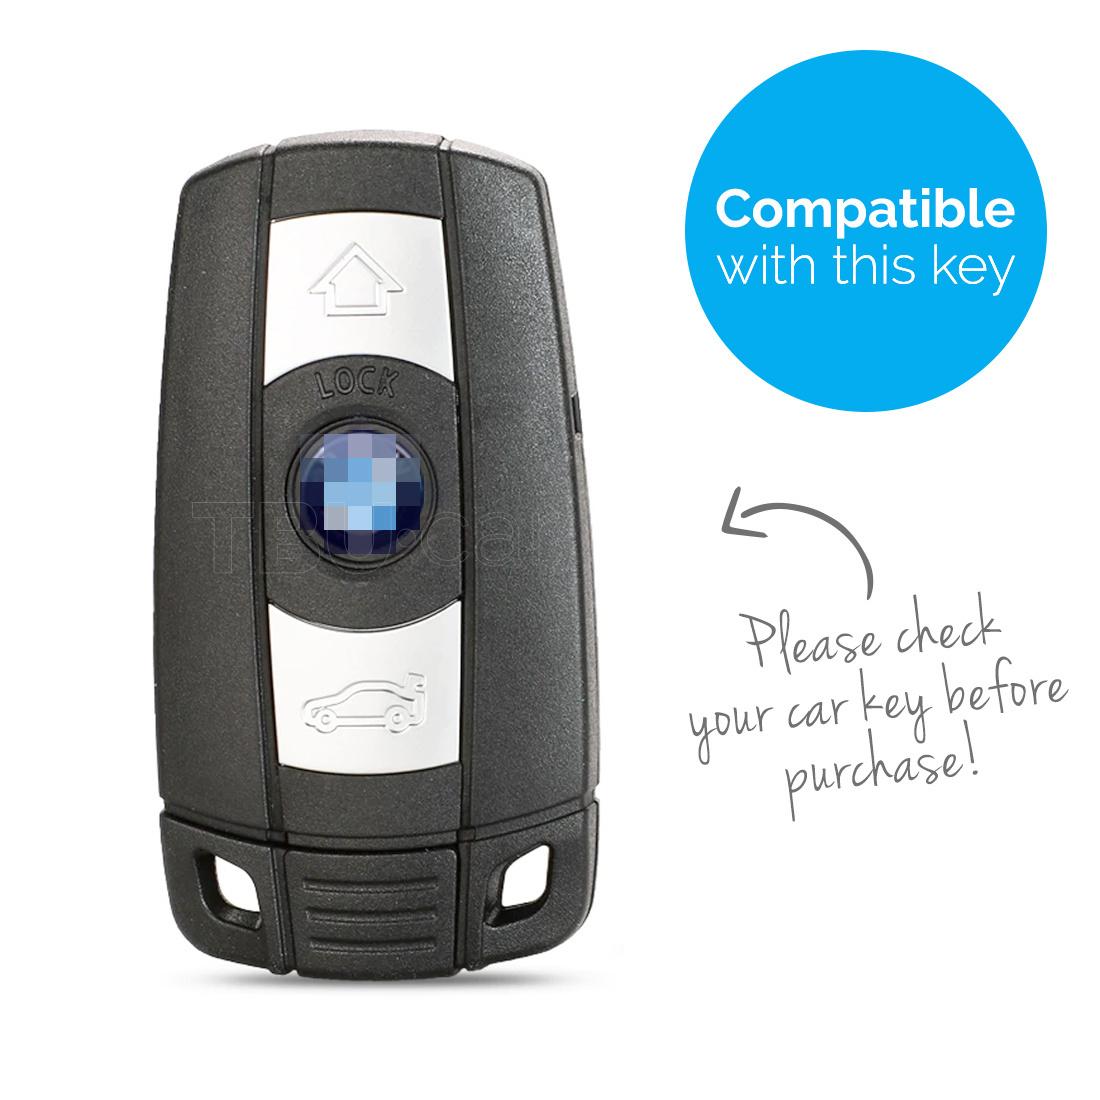 TBU car TBU car Sleutel cover compatibel met BMW - Silicone sleutelhoesje - beschermhoesje autosleutel - Glow in the Dark